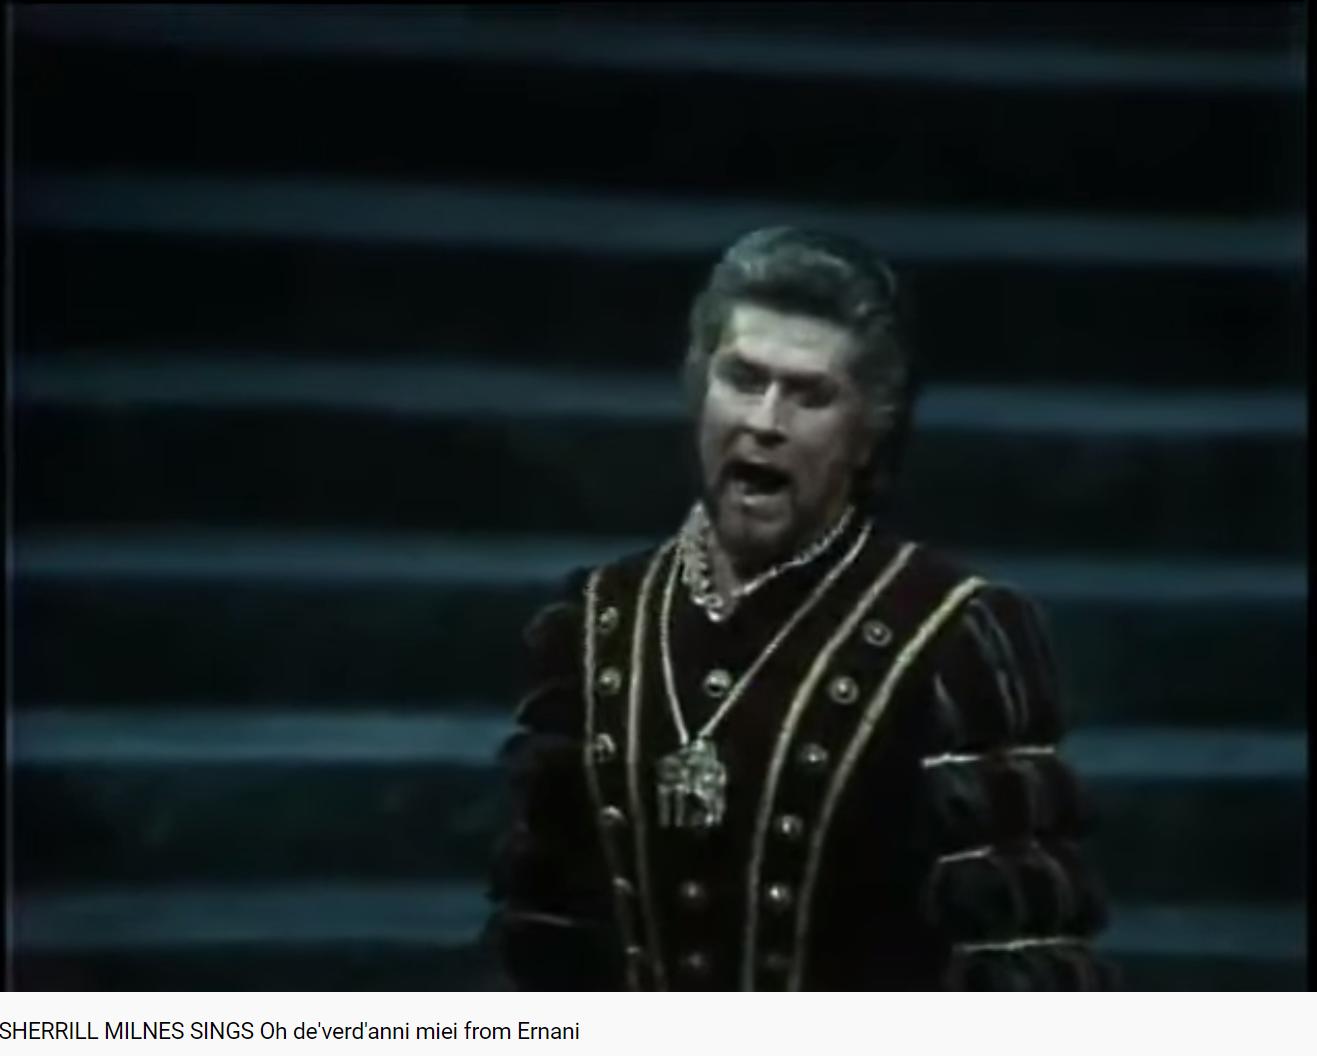 Verdi Ernani Oh de'verd'anni miei (MET 1983)